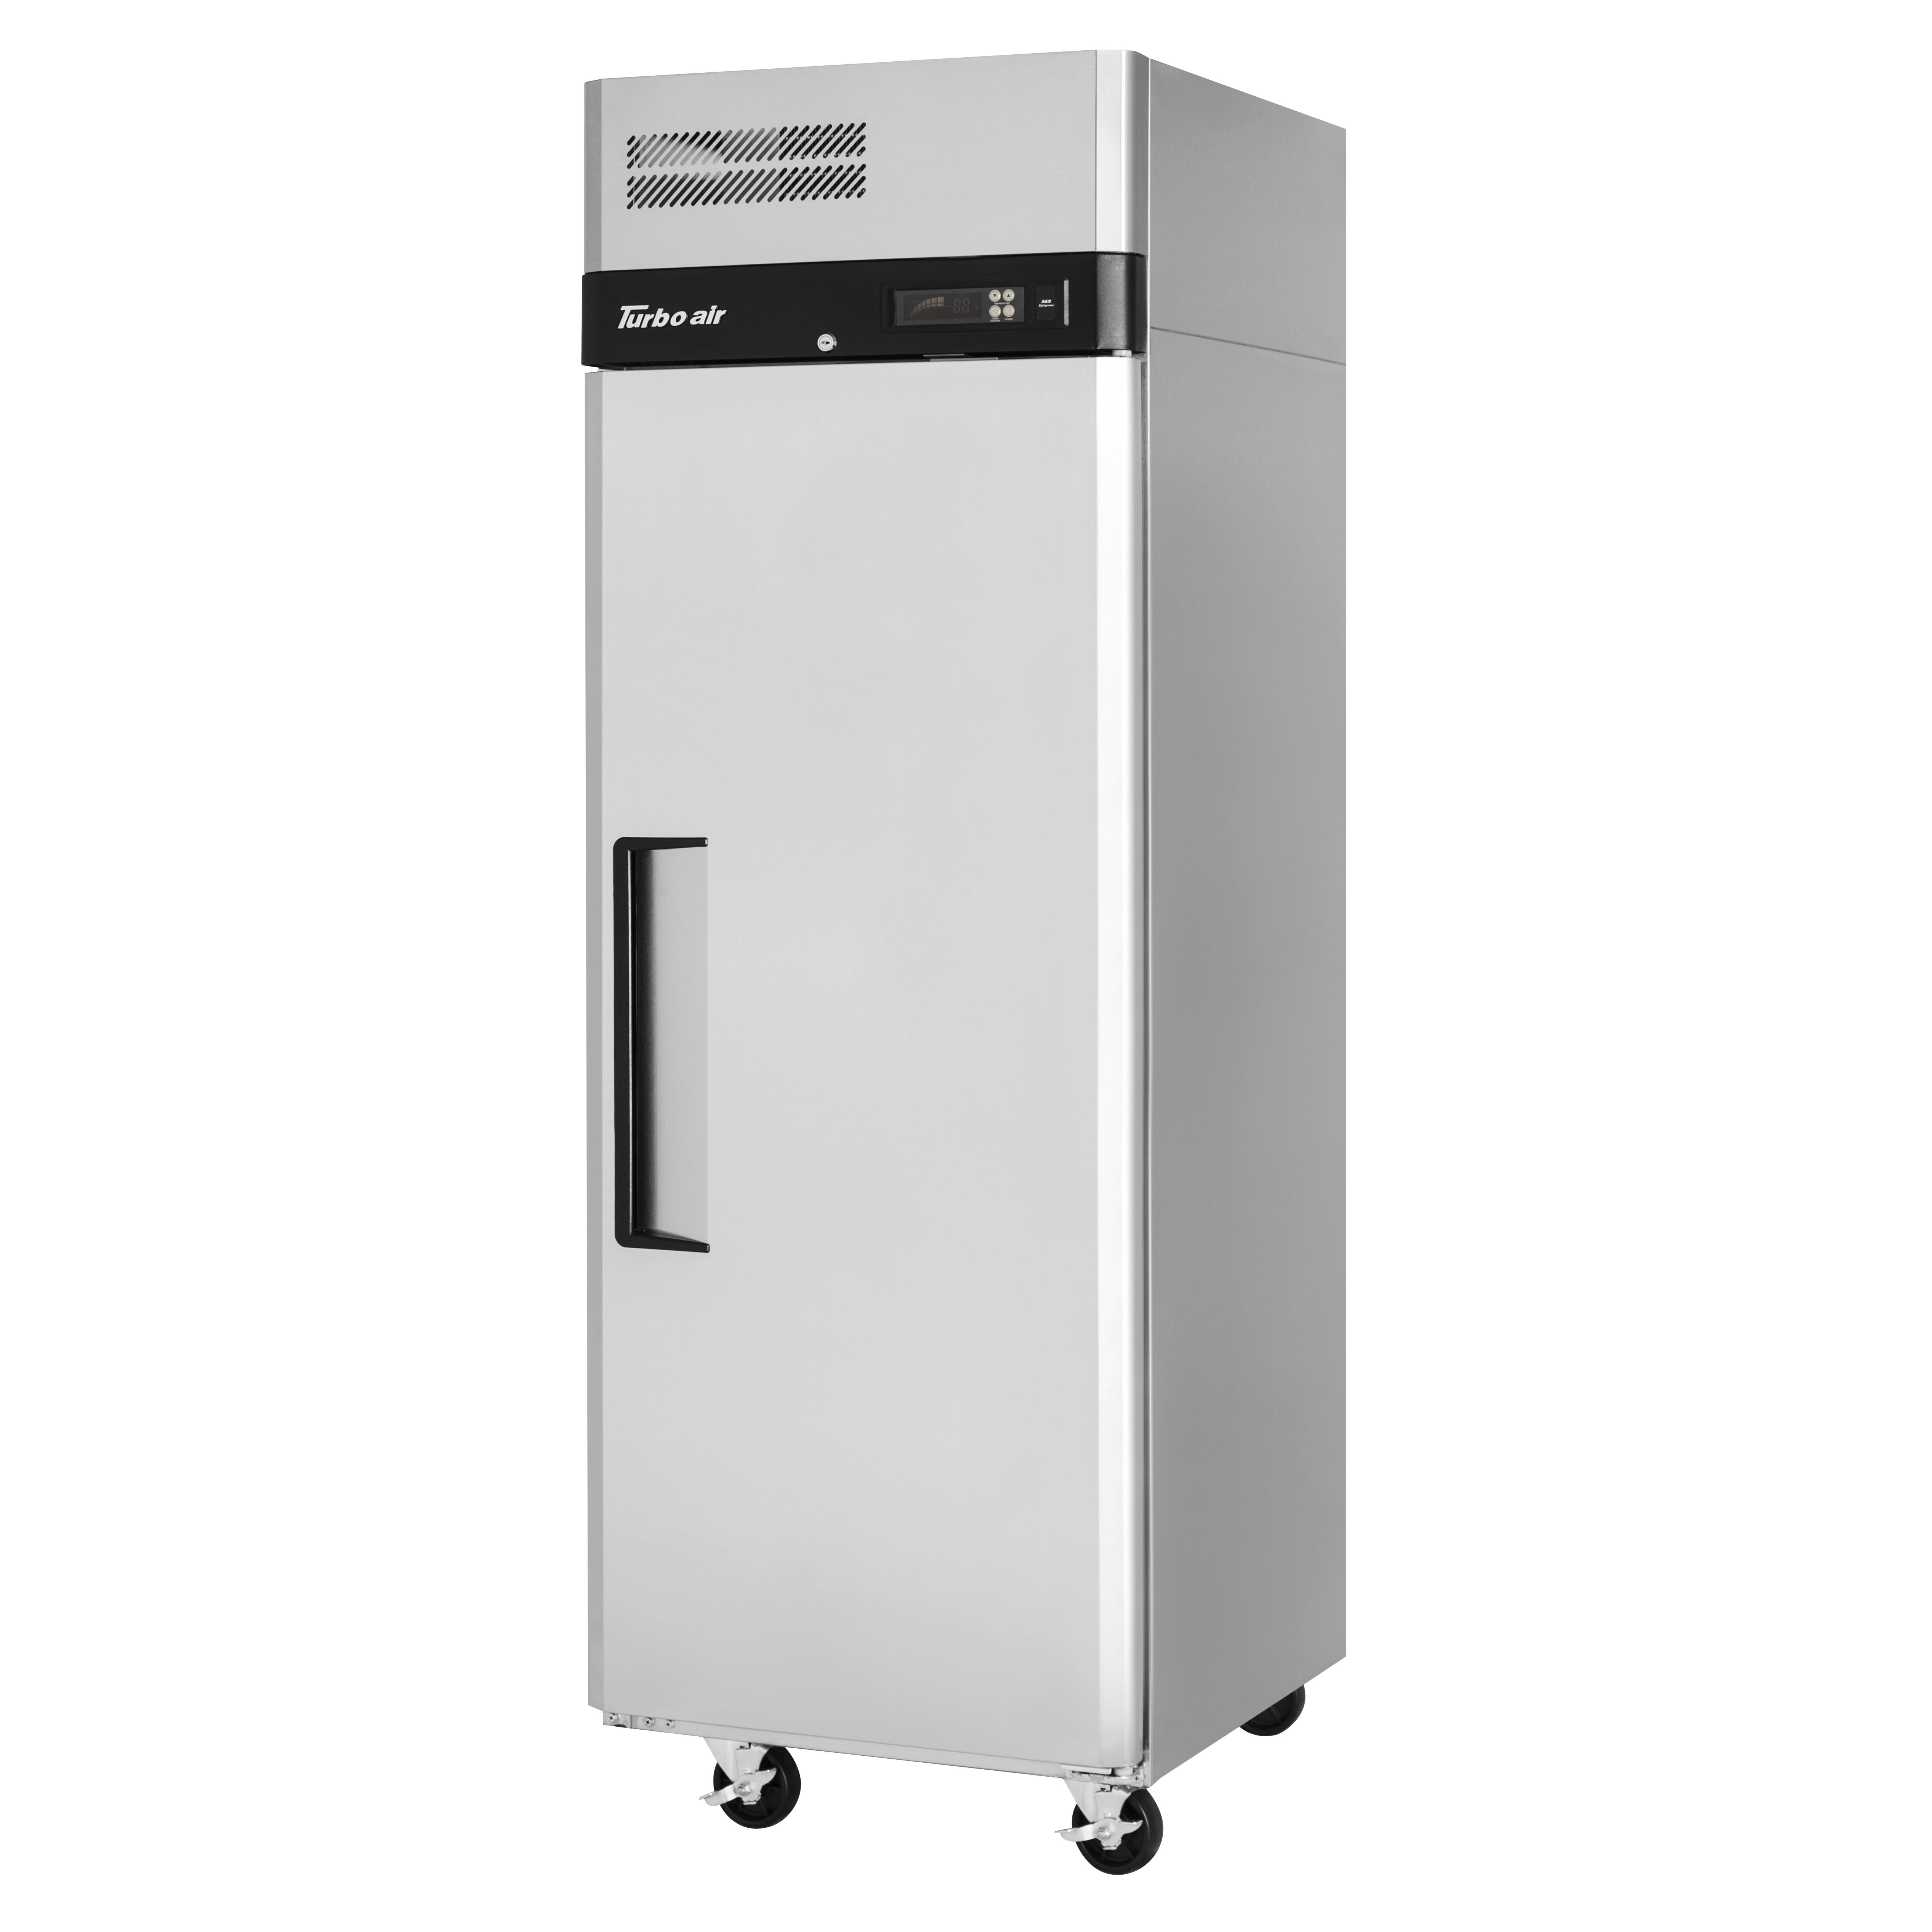 Turbo Air M3R24-1-N refrigerator, reach-in